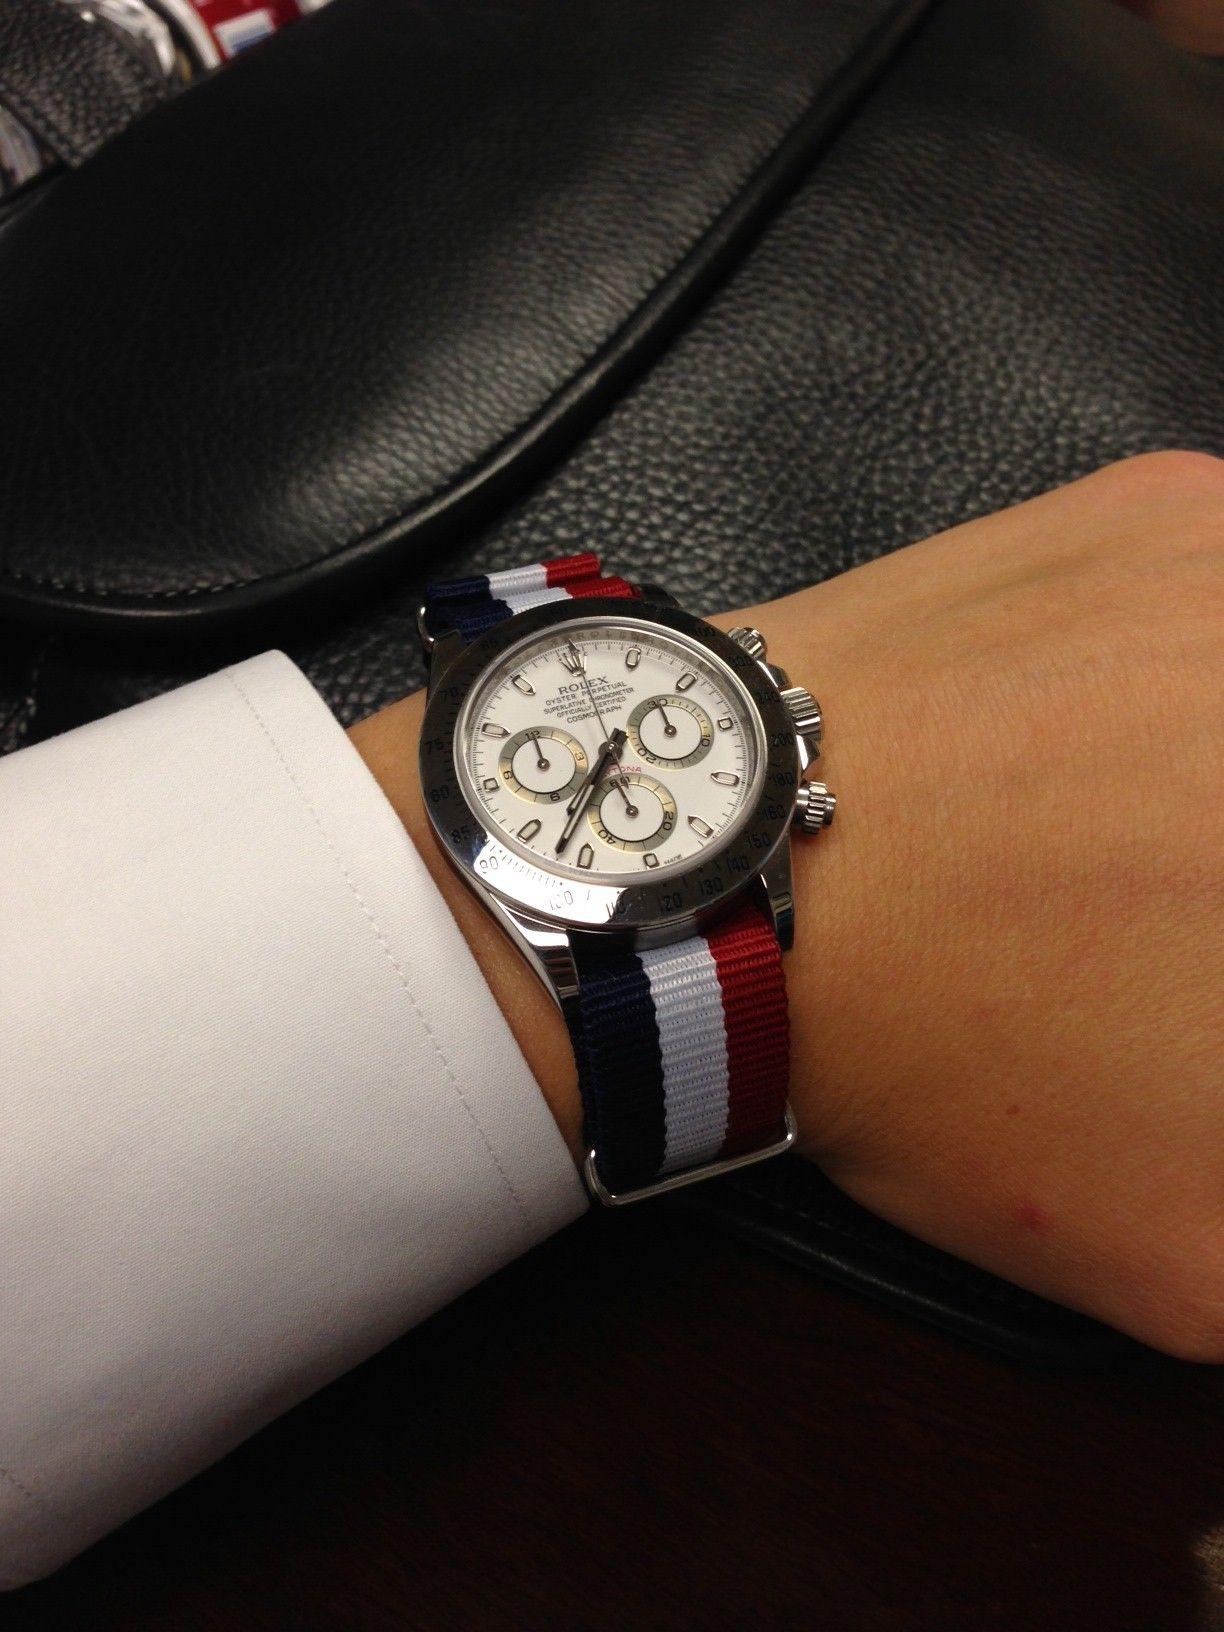 Pin by United Watch Band on United Watch Bands   Rolex daytona ... 38158bdd42eb